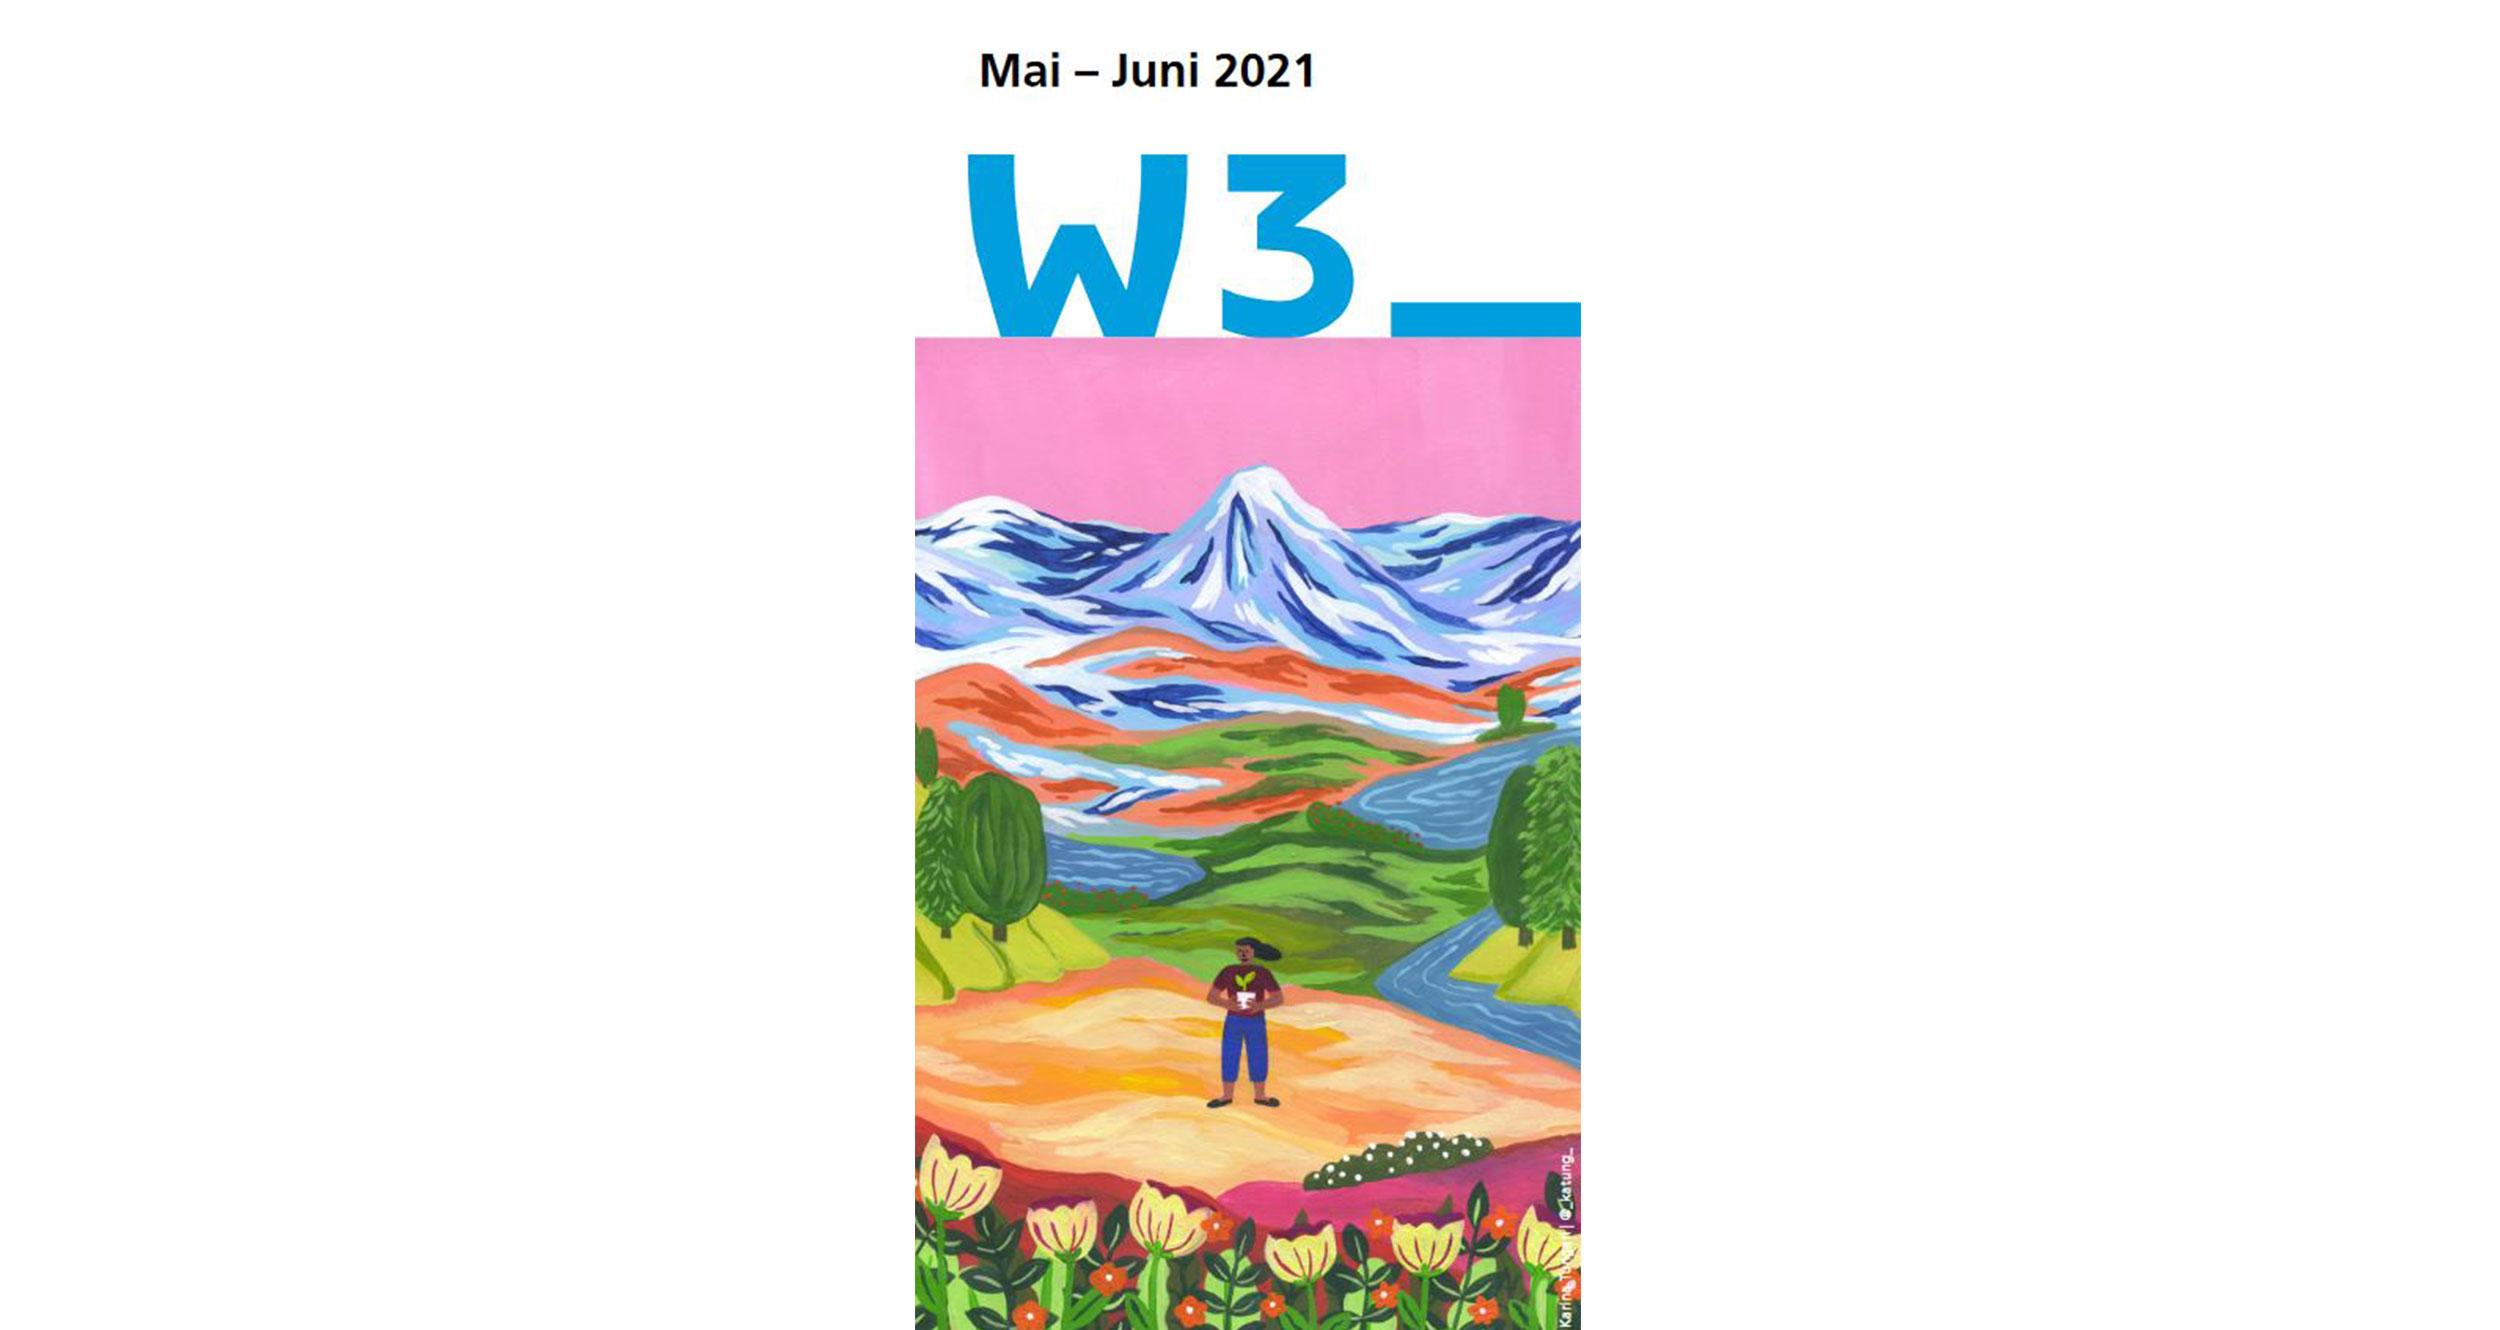 Programmcover Mai-Juni mit Illustration von Karina Tungari